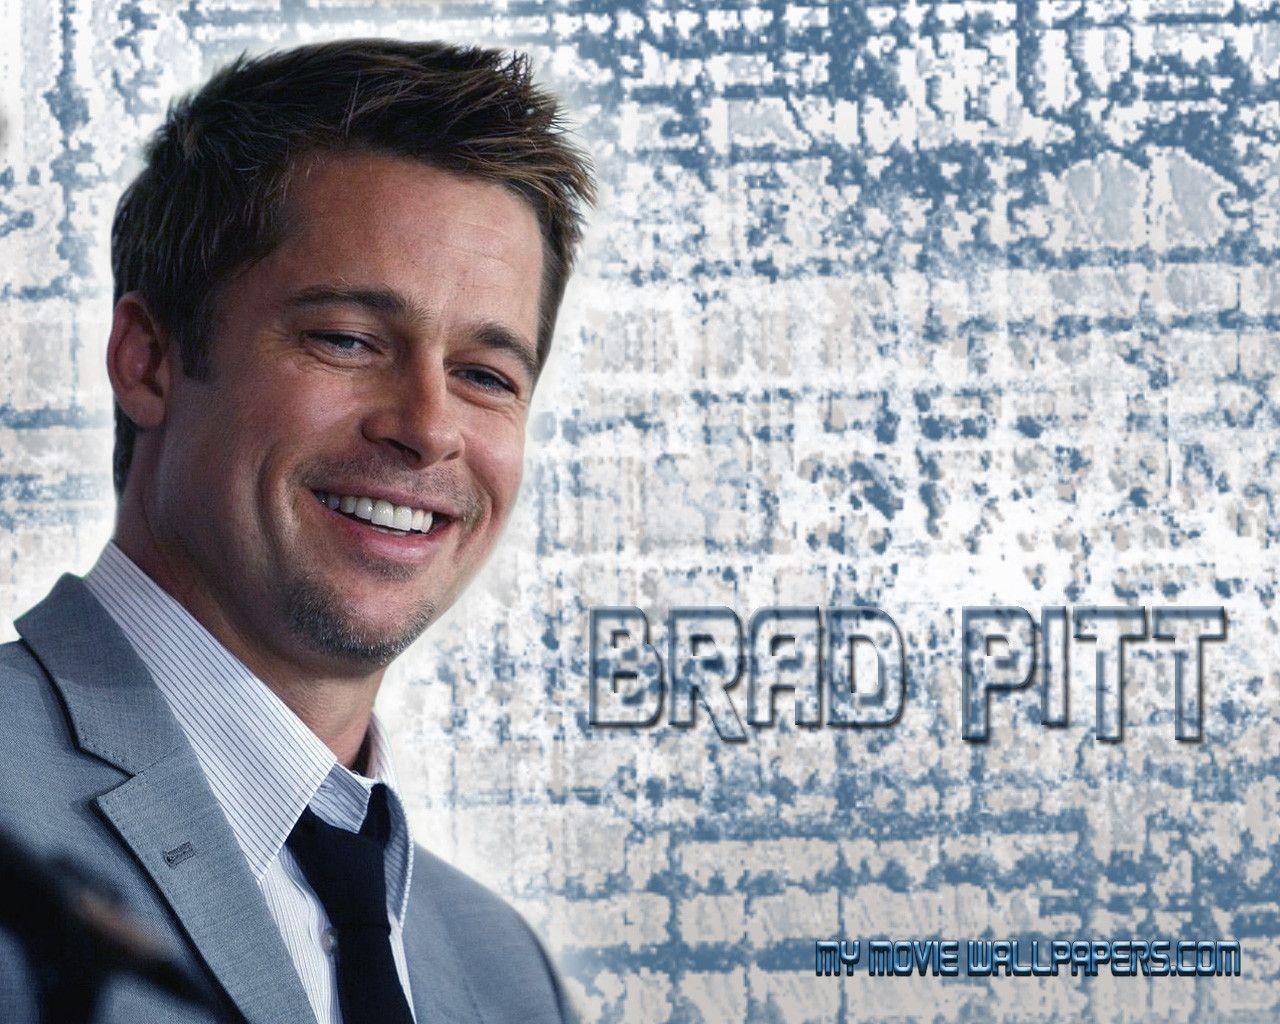 Brad Pitt Wallpapers - Wallpaper Cave - photo #27